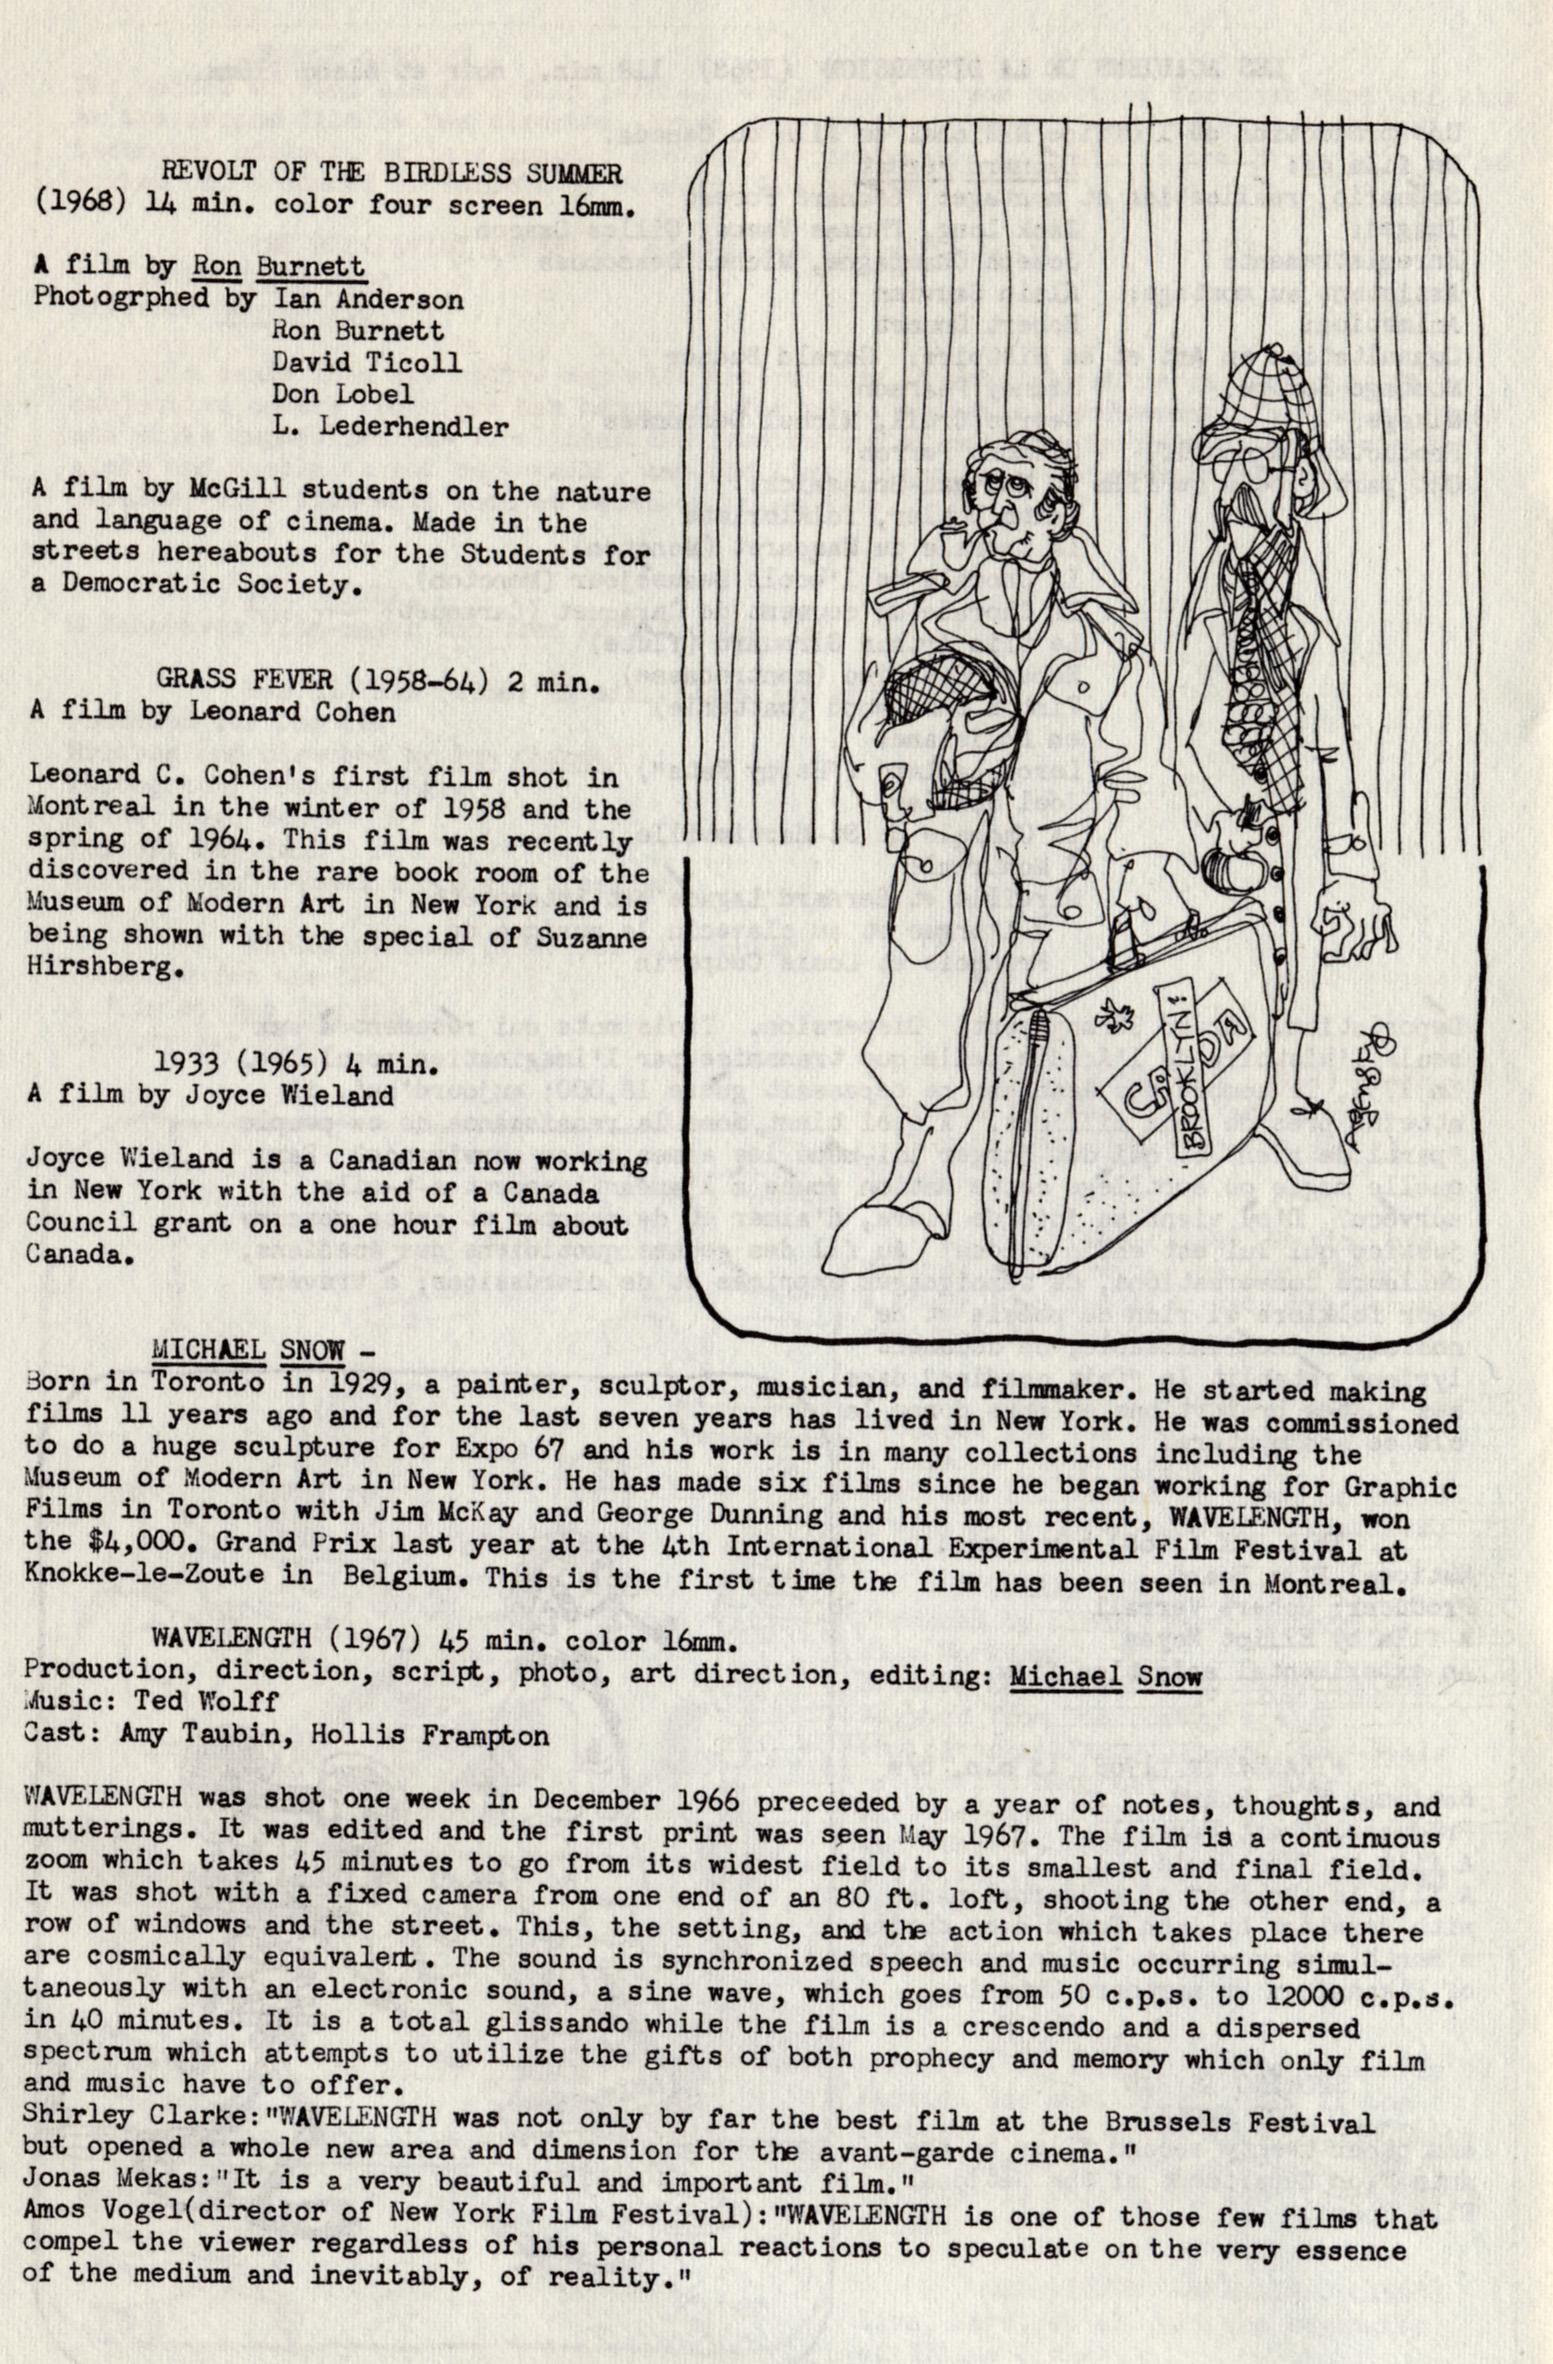 Canadian Film Festival (1968)